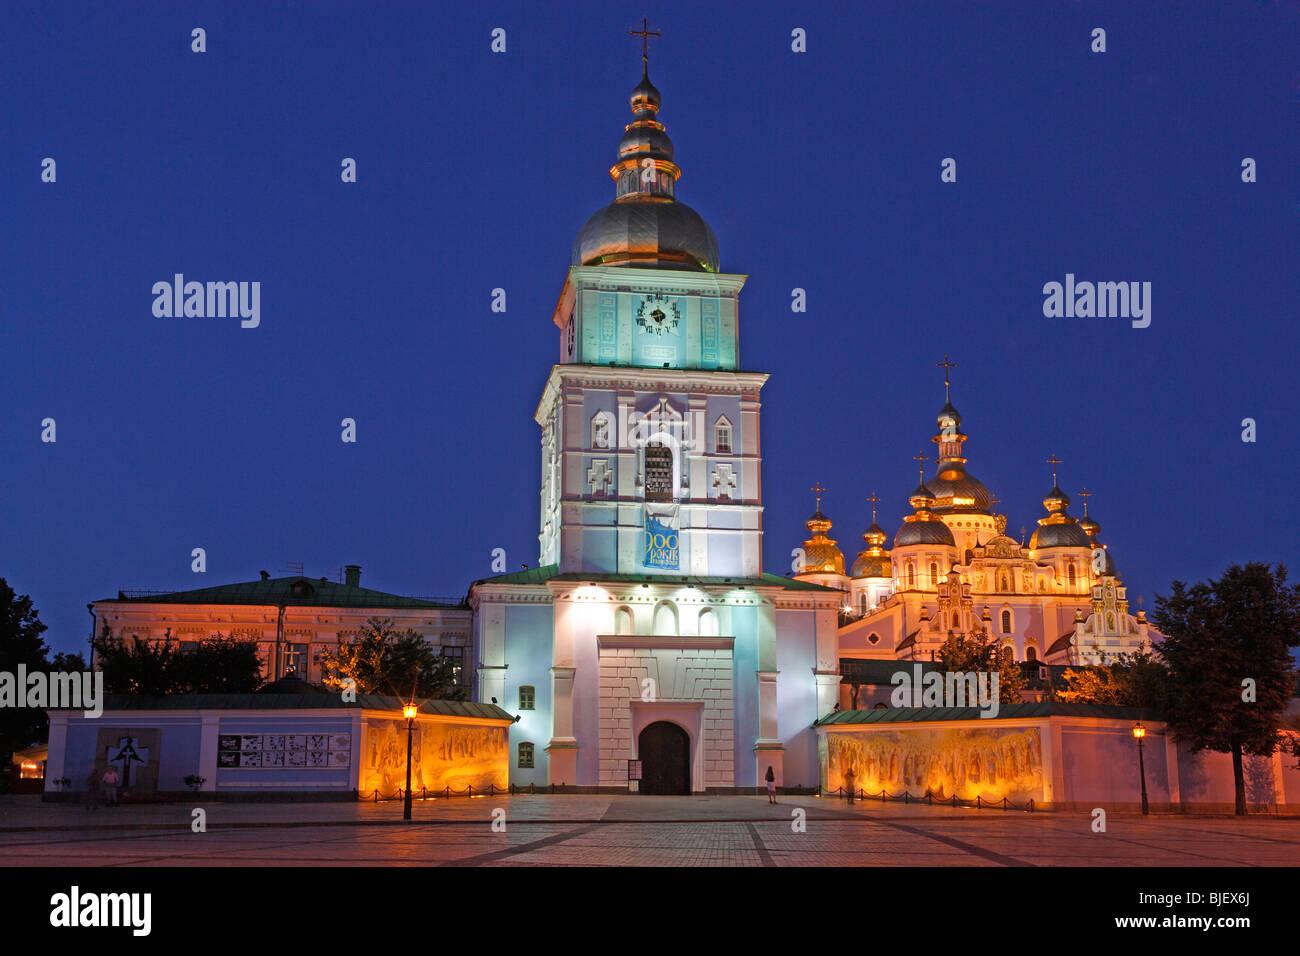 St. Michael of the Golden Cupolas monastery,Kiev,Ukraine - Stock Image